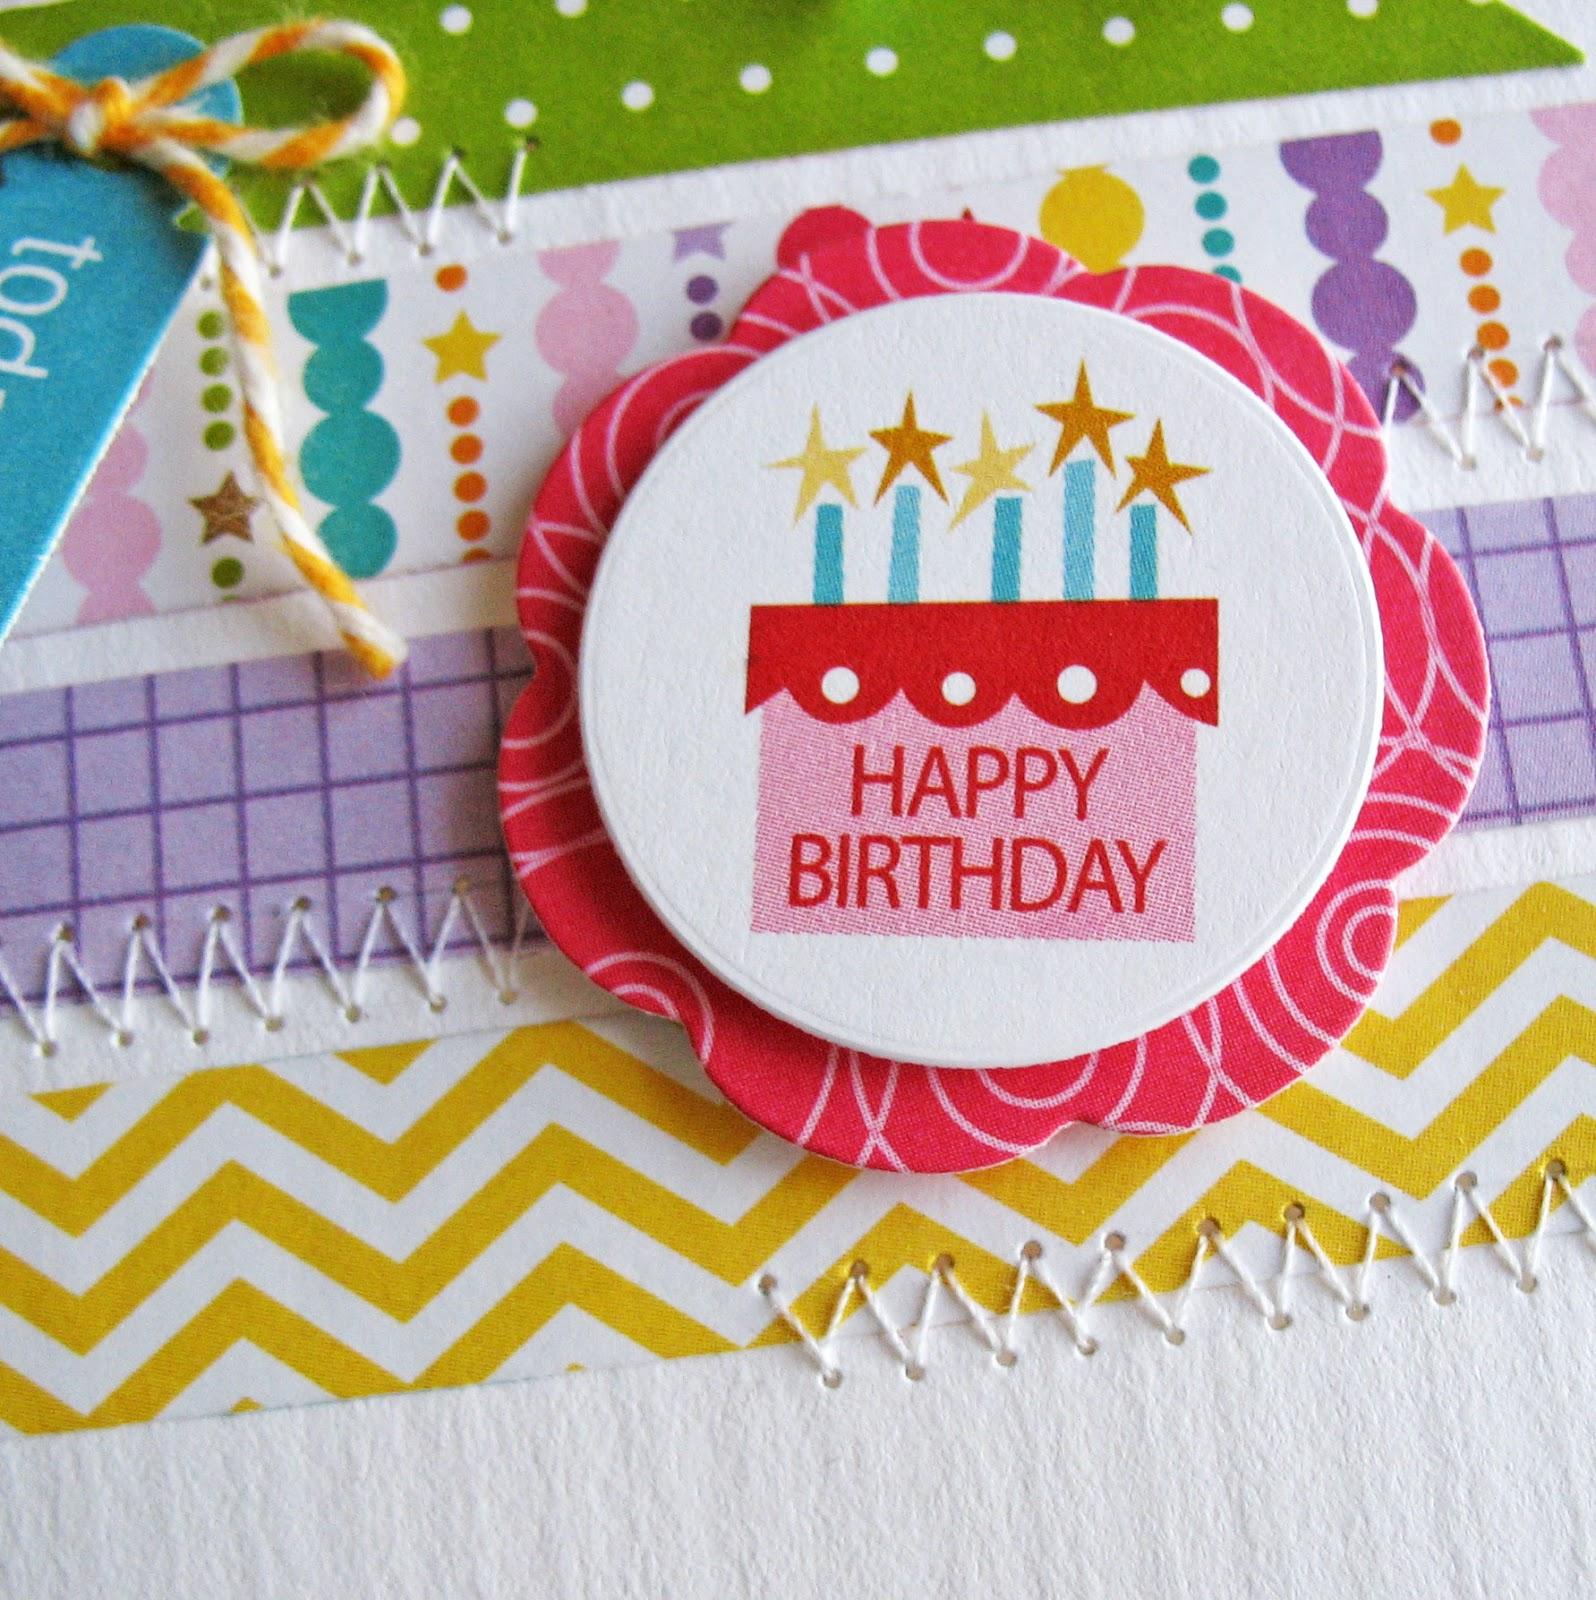 cardblanckathy martin happy birthday